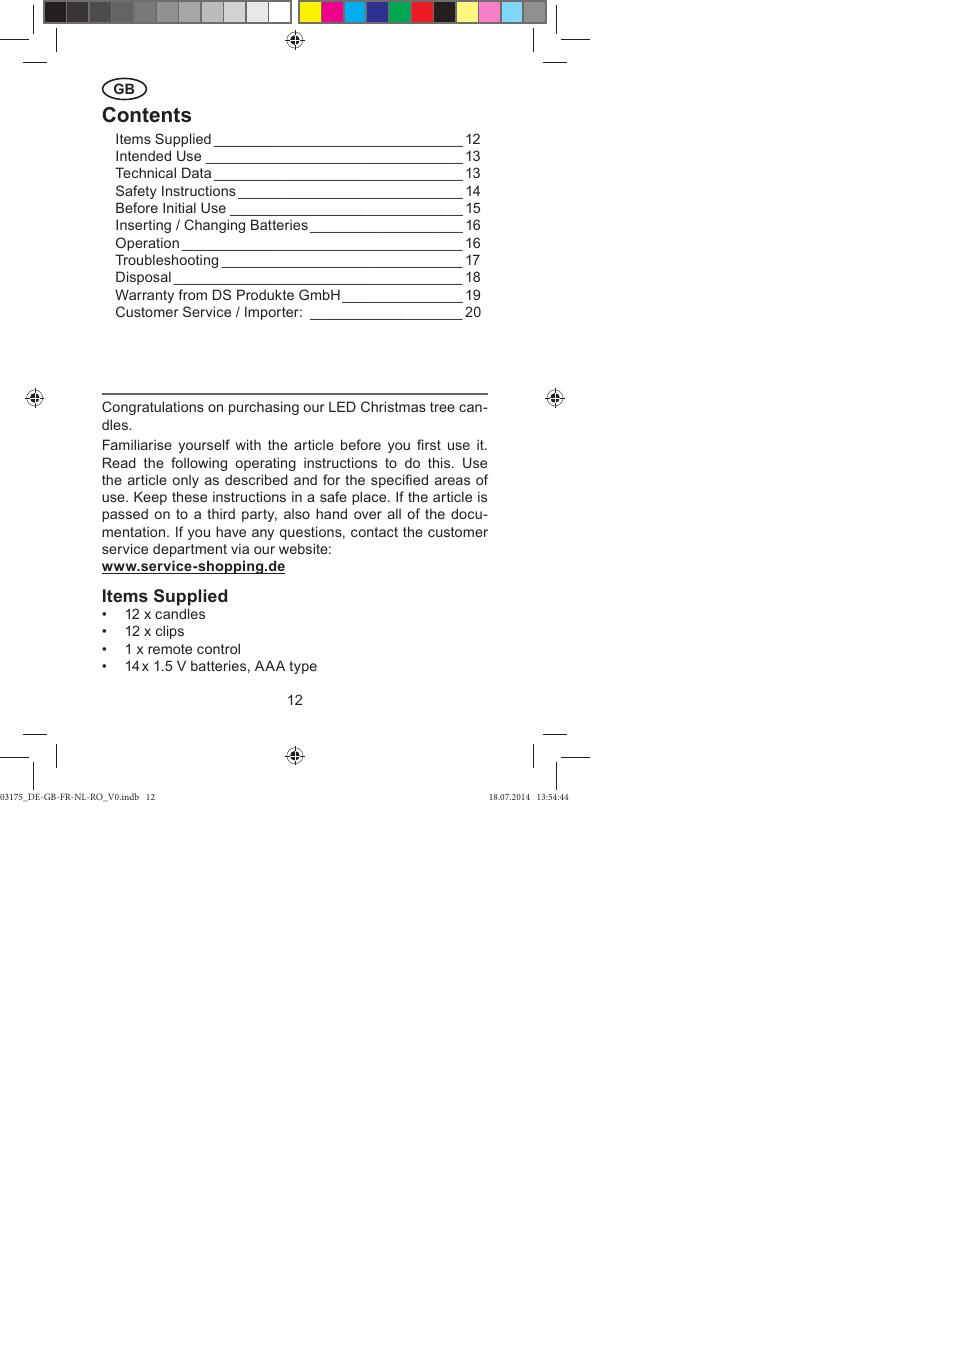 medium resolution of melinera led christmas tree lights user manual page 12 52